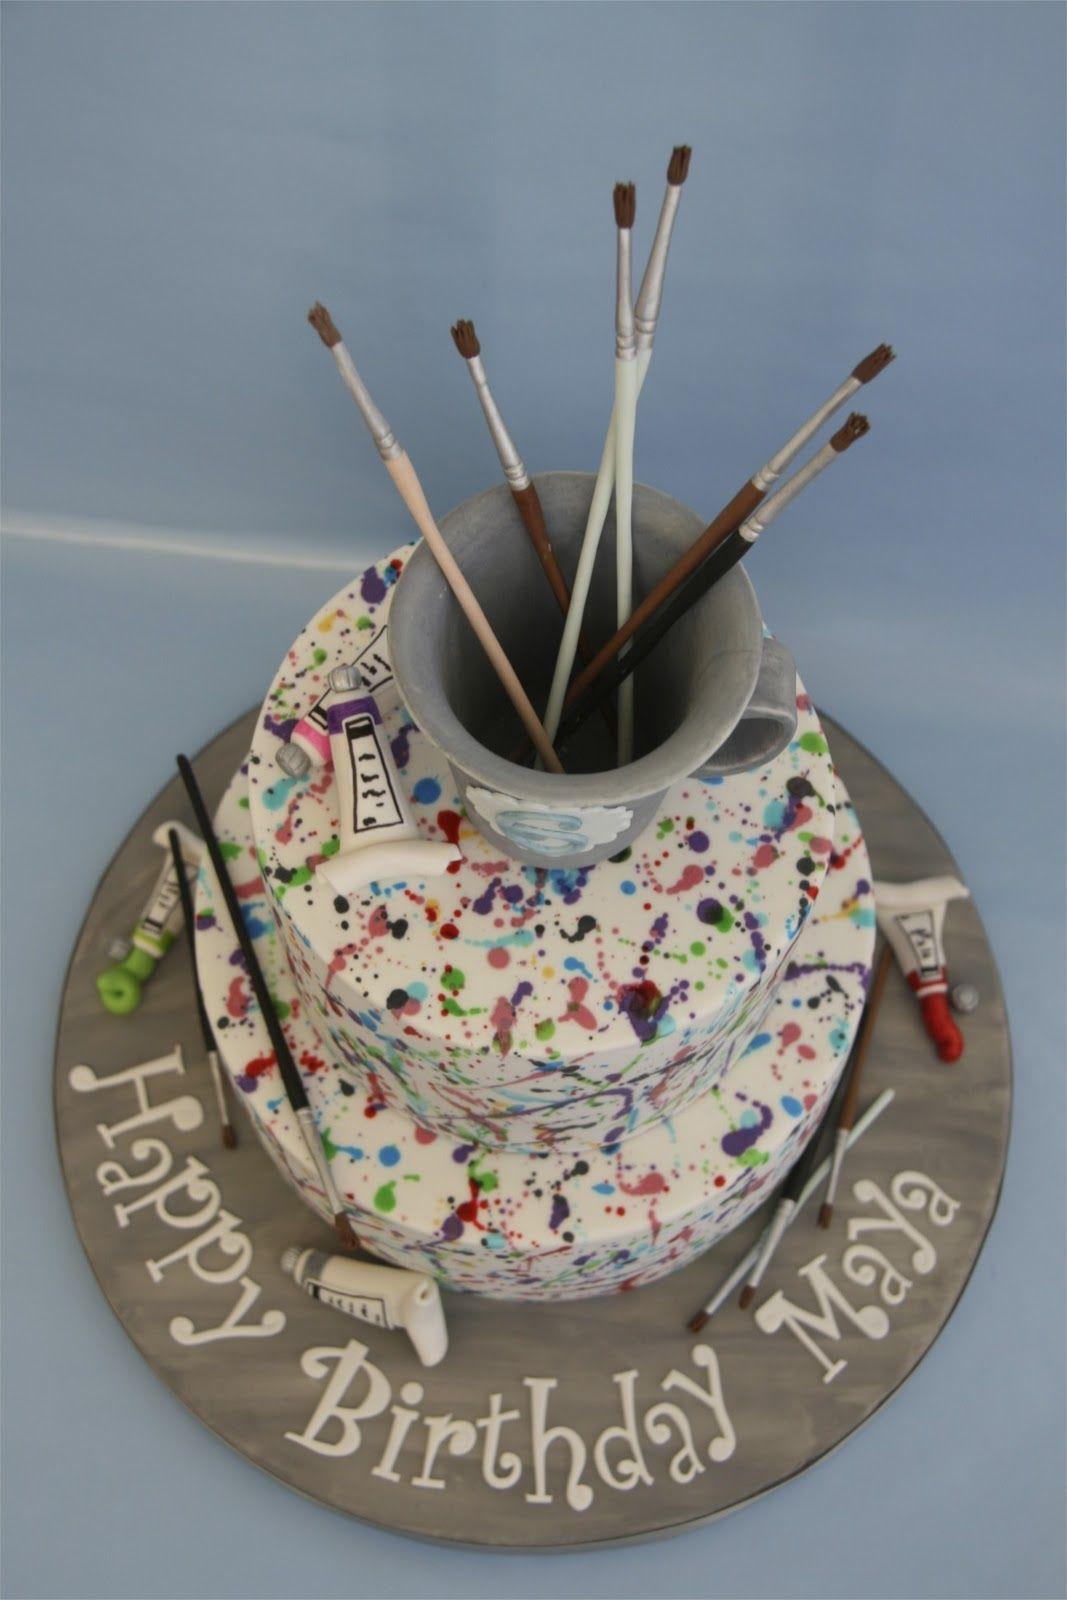 painters cake Sweet cake design paint splatter cake Rileys